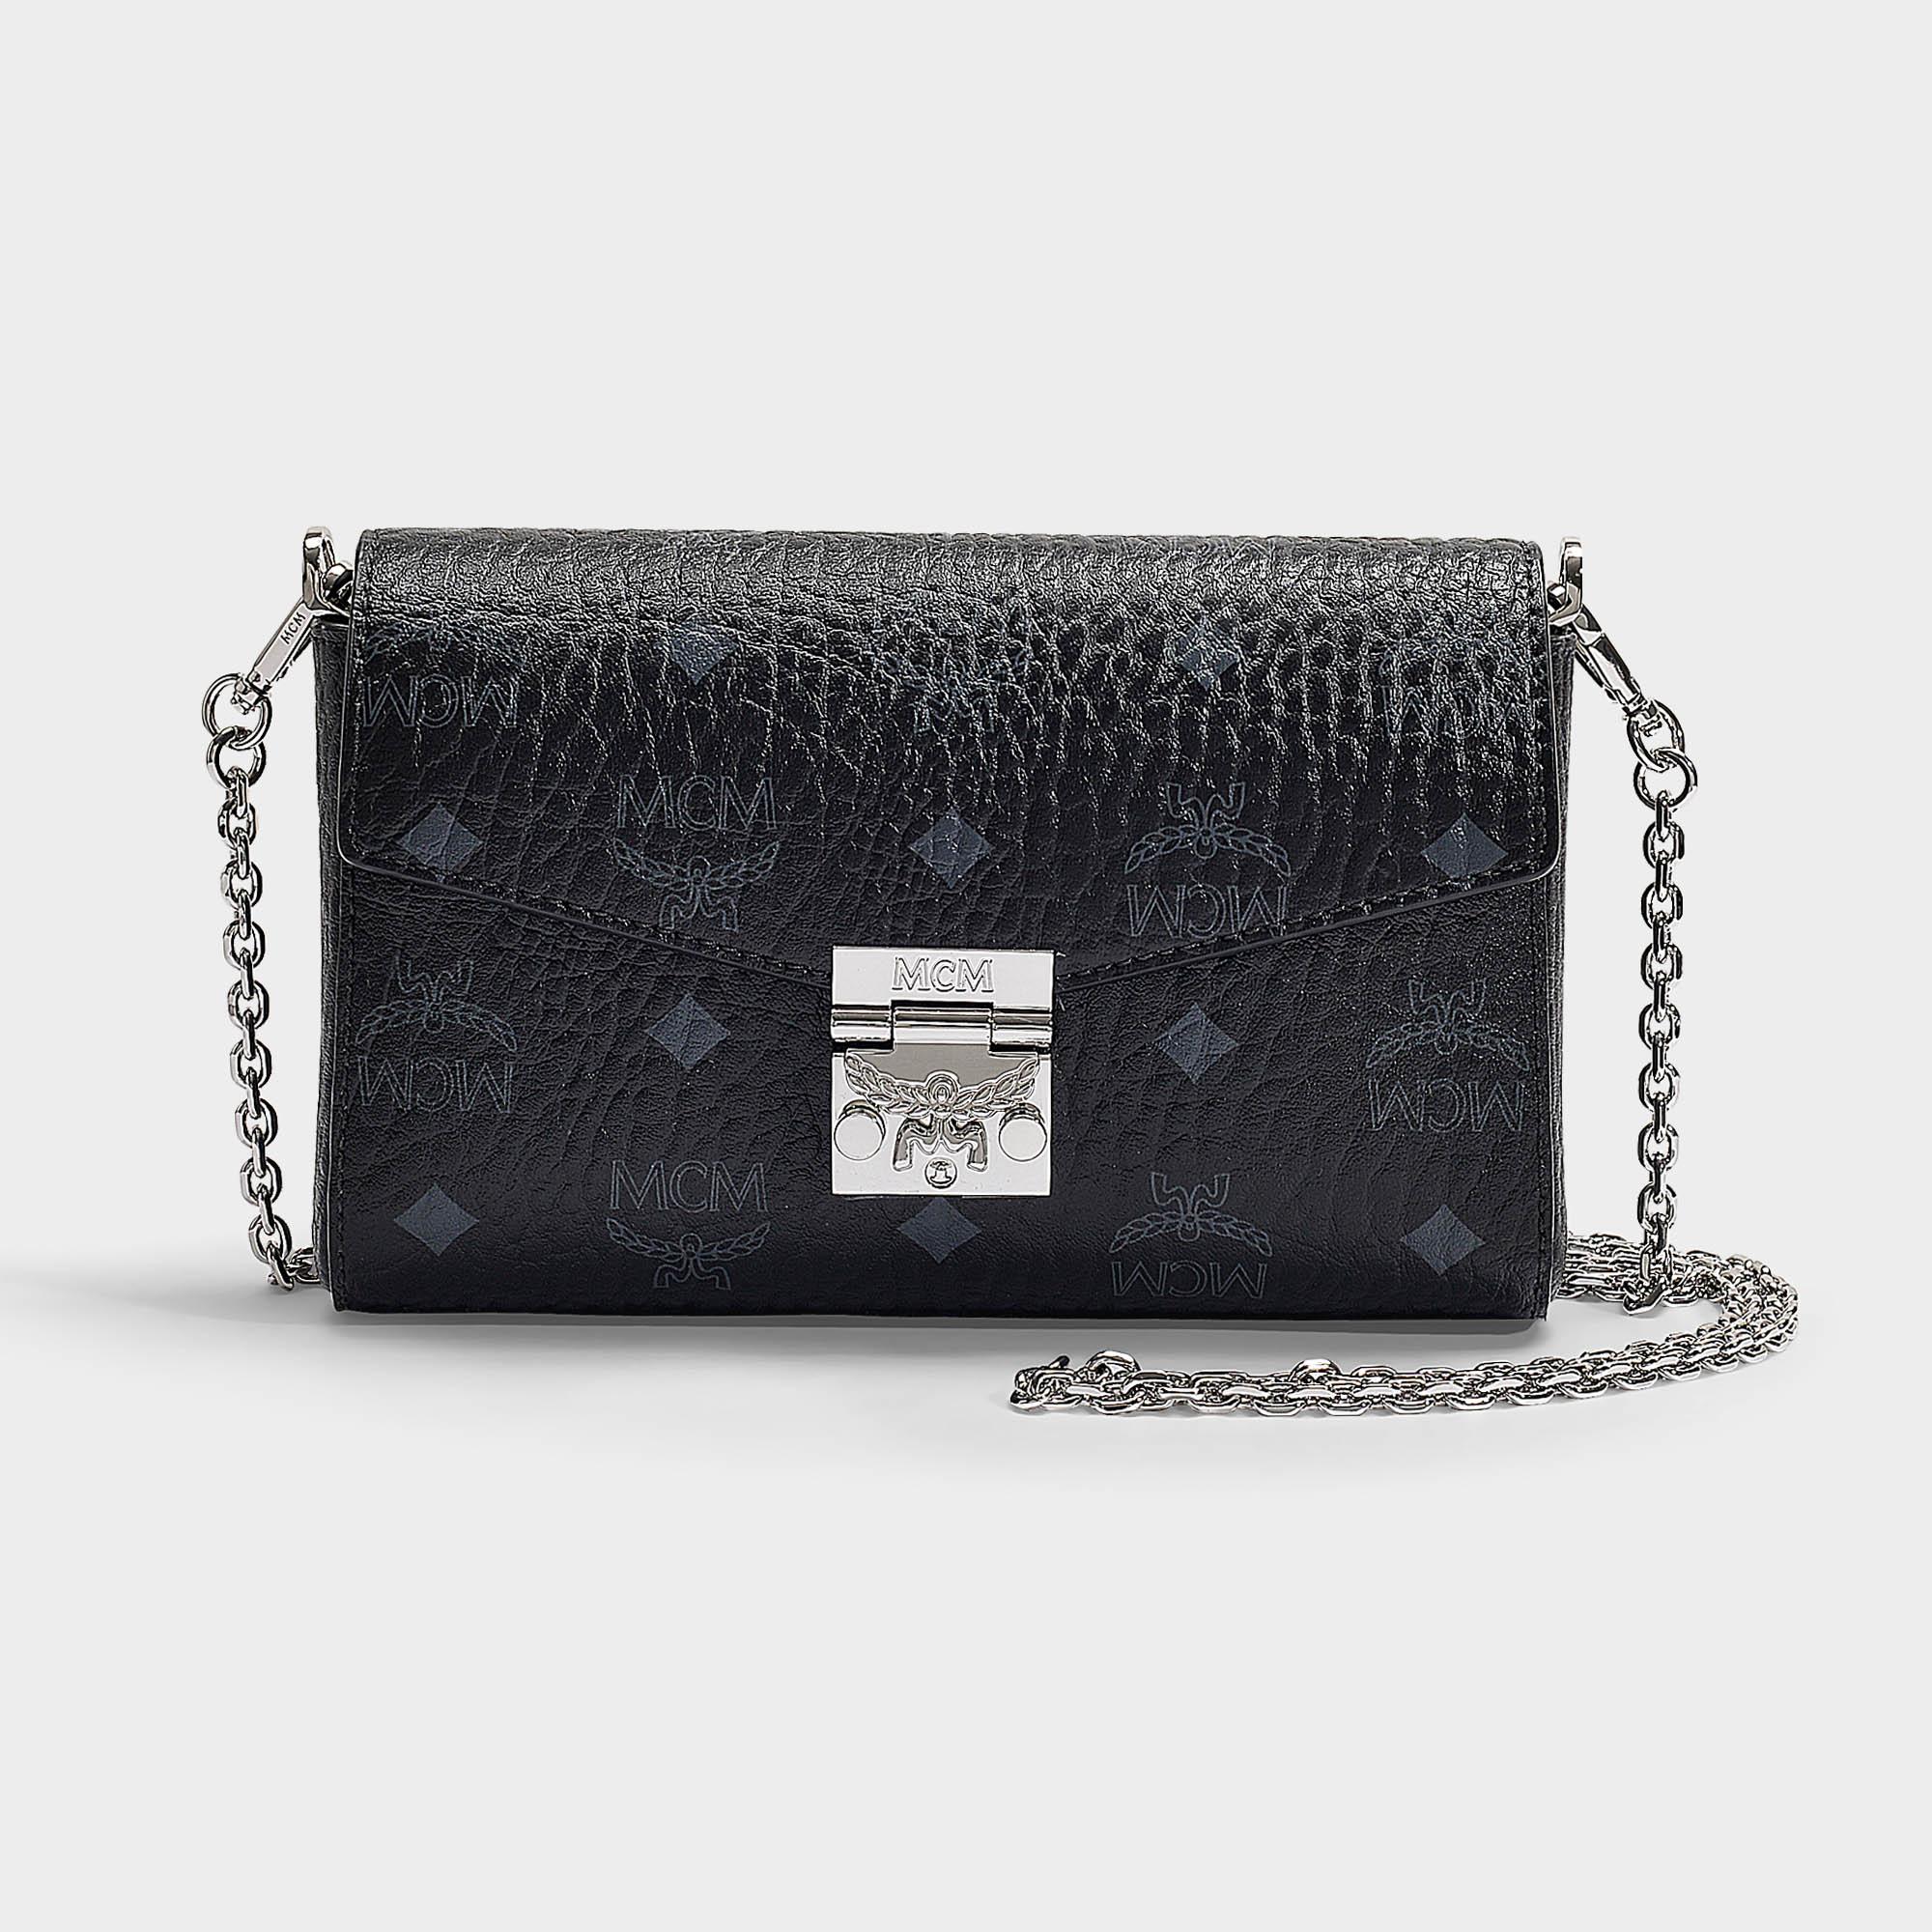 780a5397af28 Mcm | Millie Visetos Small Crossbody Bag In Black Coated Canvas ...